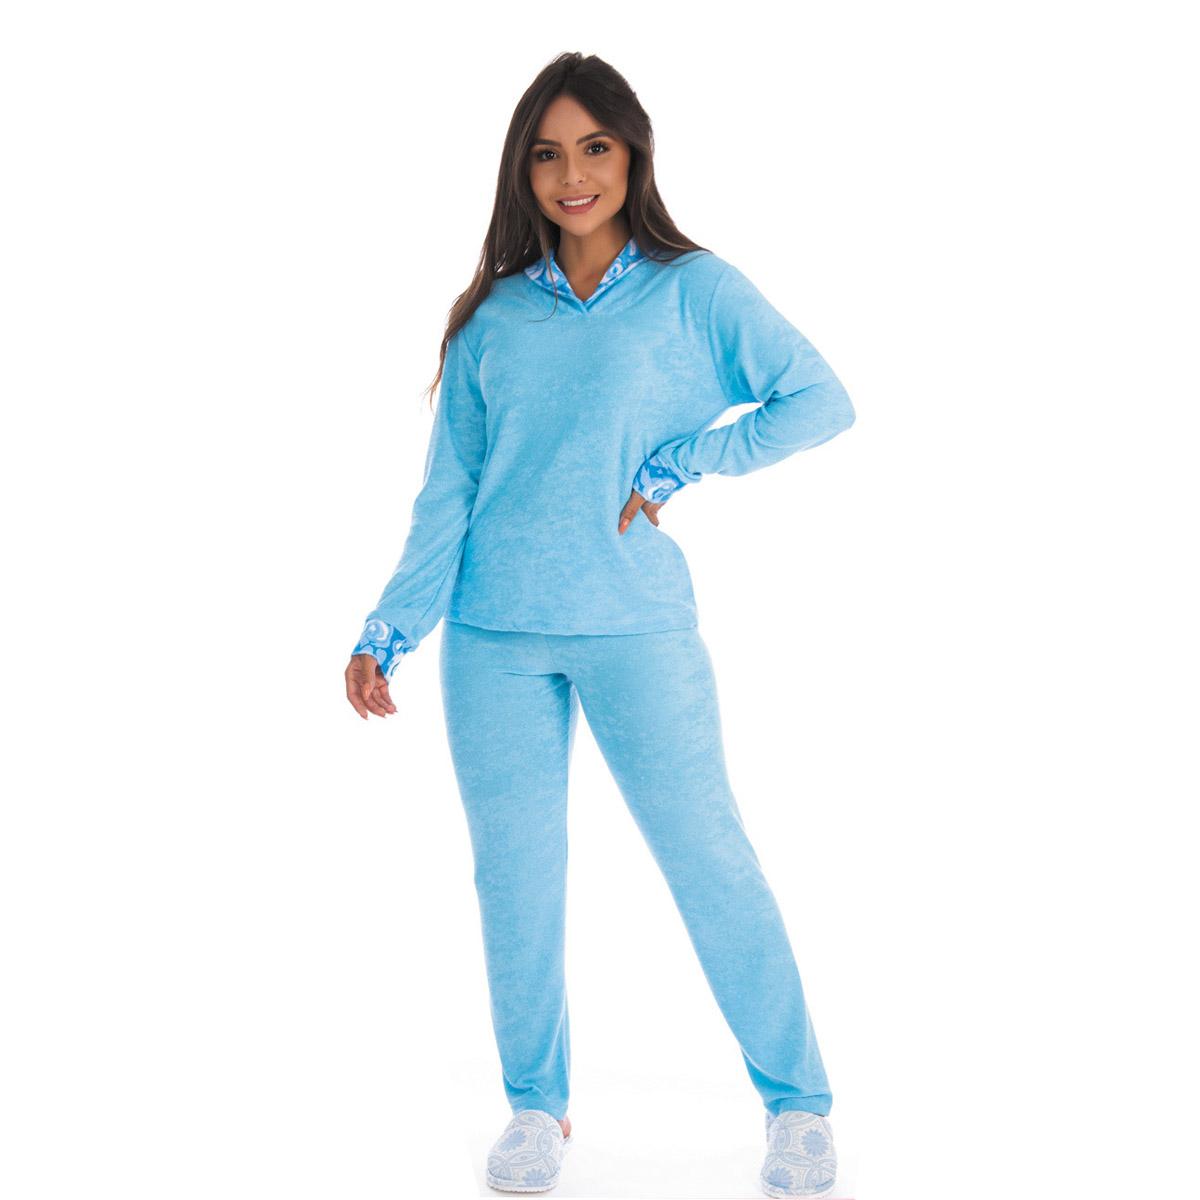 Pijama de inverno feminino CLASSIC Victory